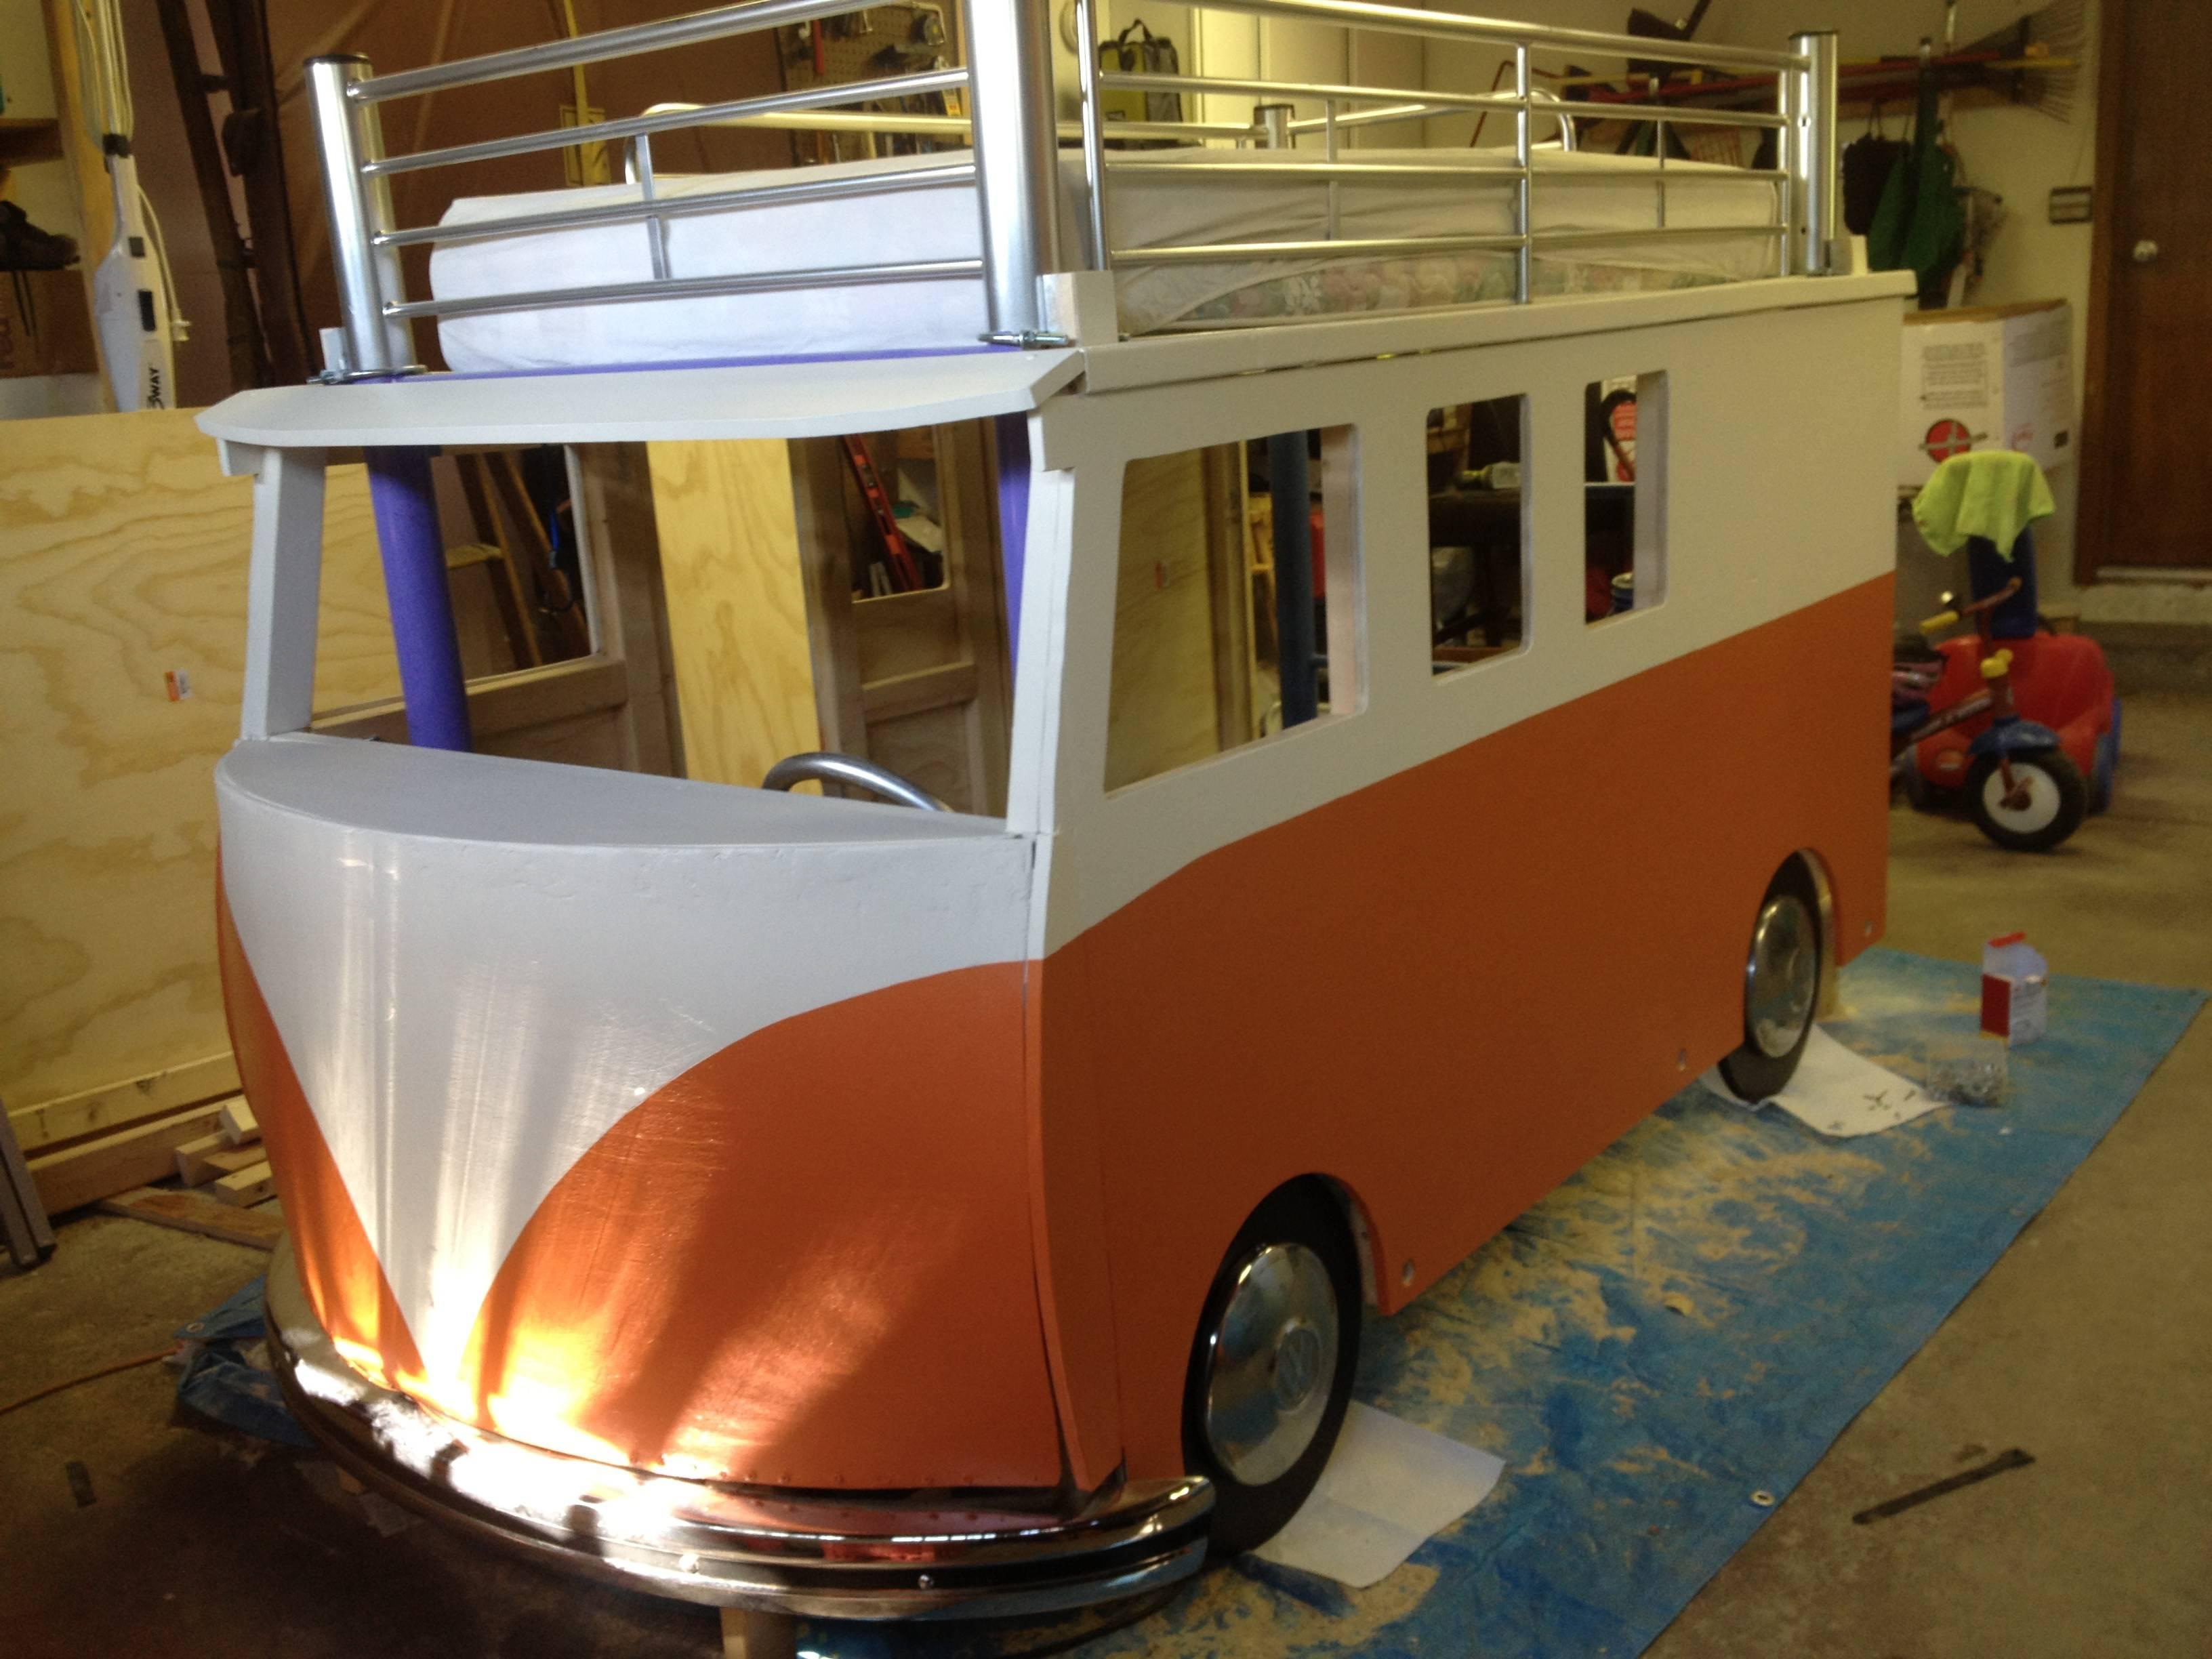 best dad ever builds vw bus bed for 3 year old daughter autoevolution. Black Bedroom Furniture Sets. Home Design Ideas